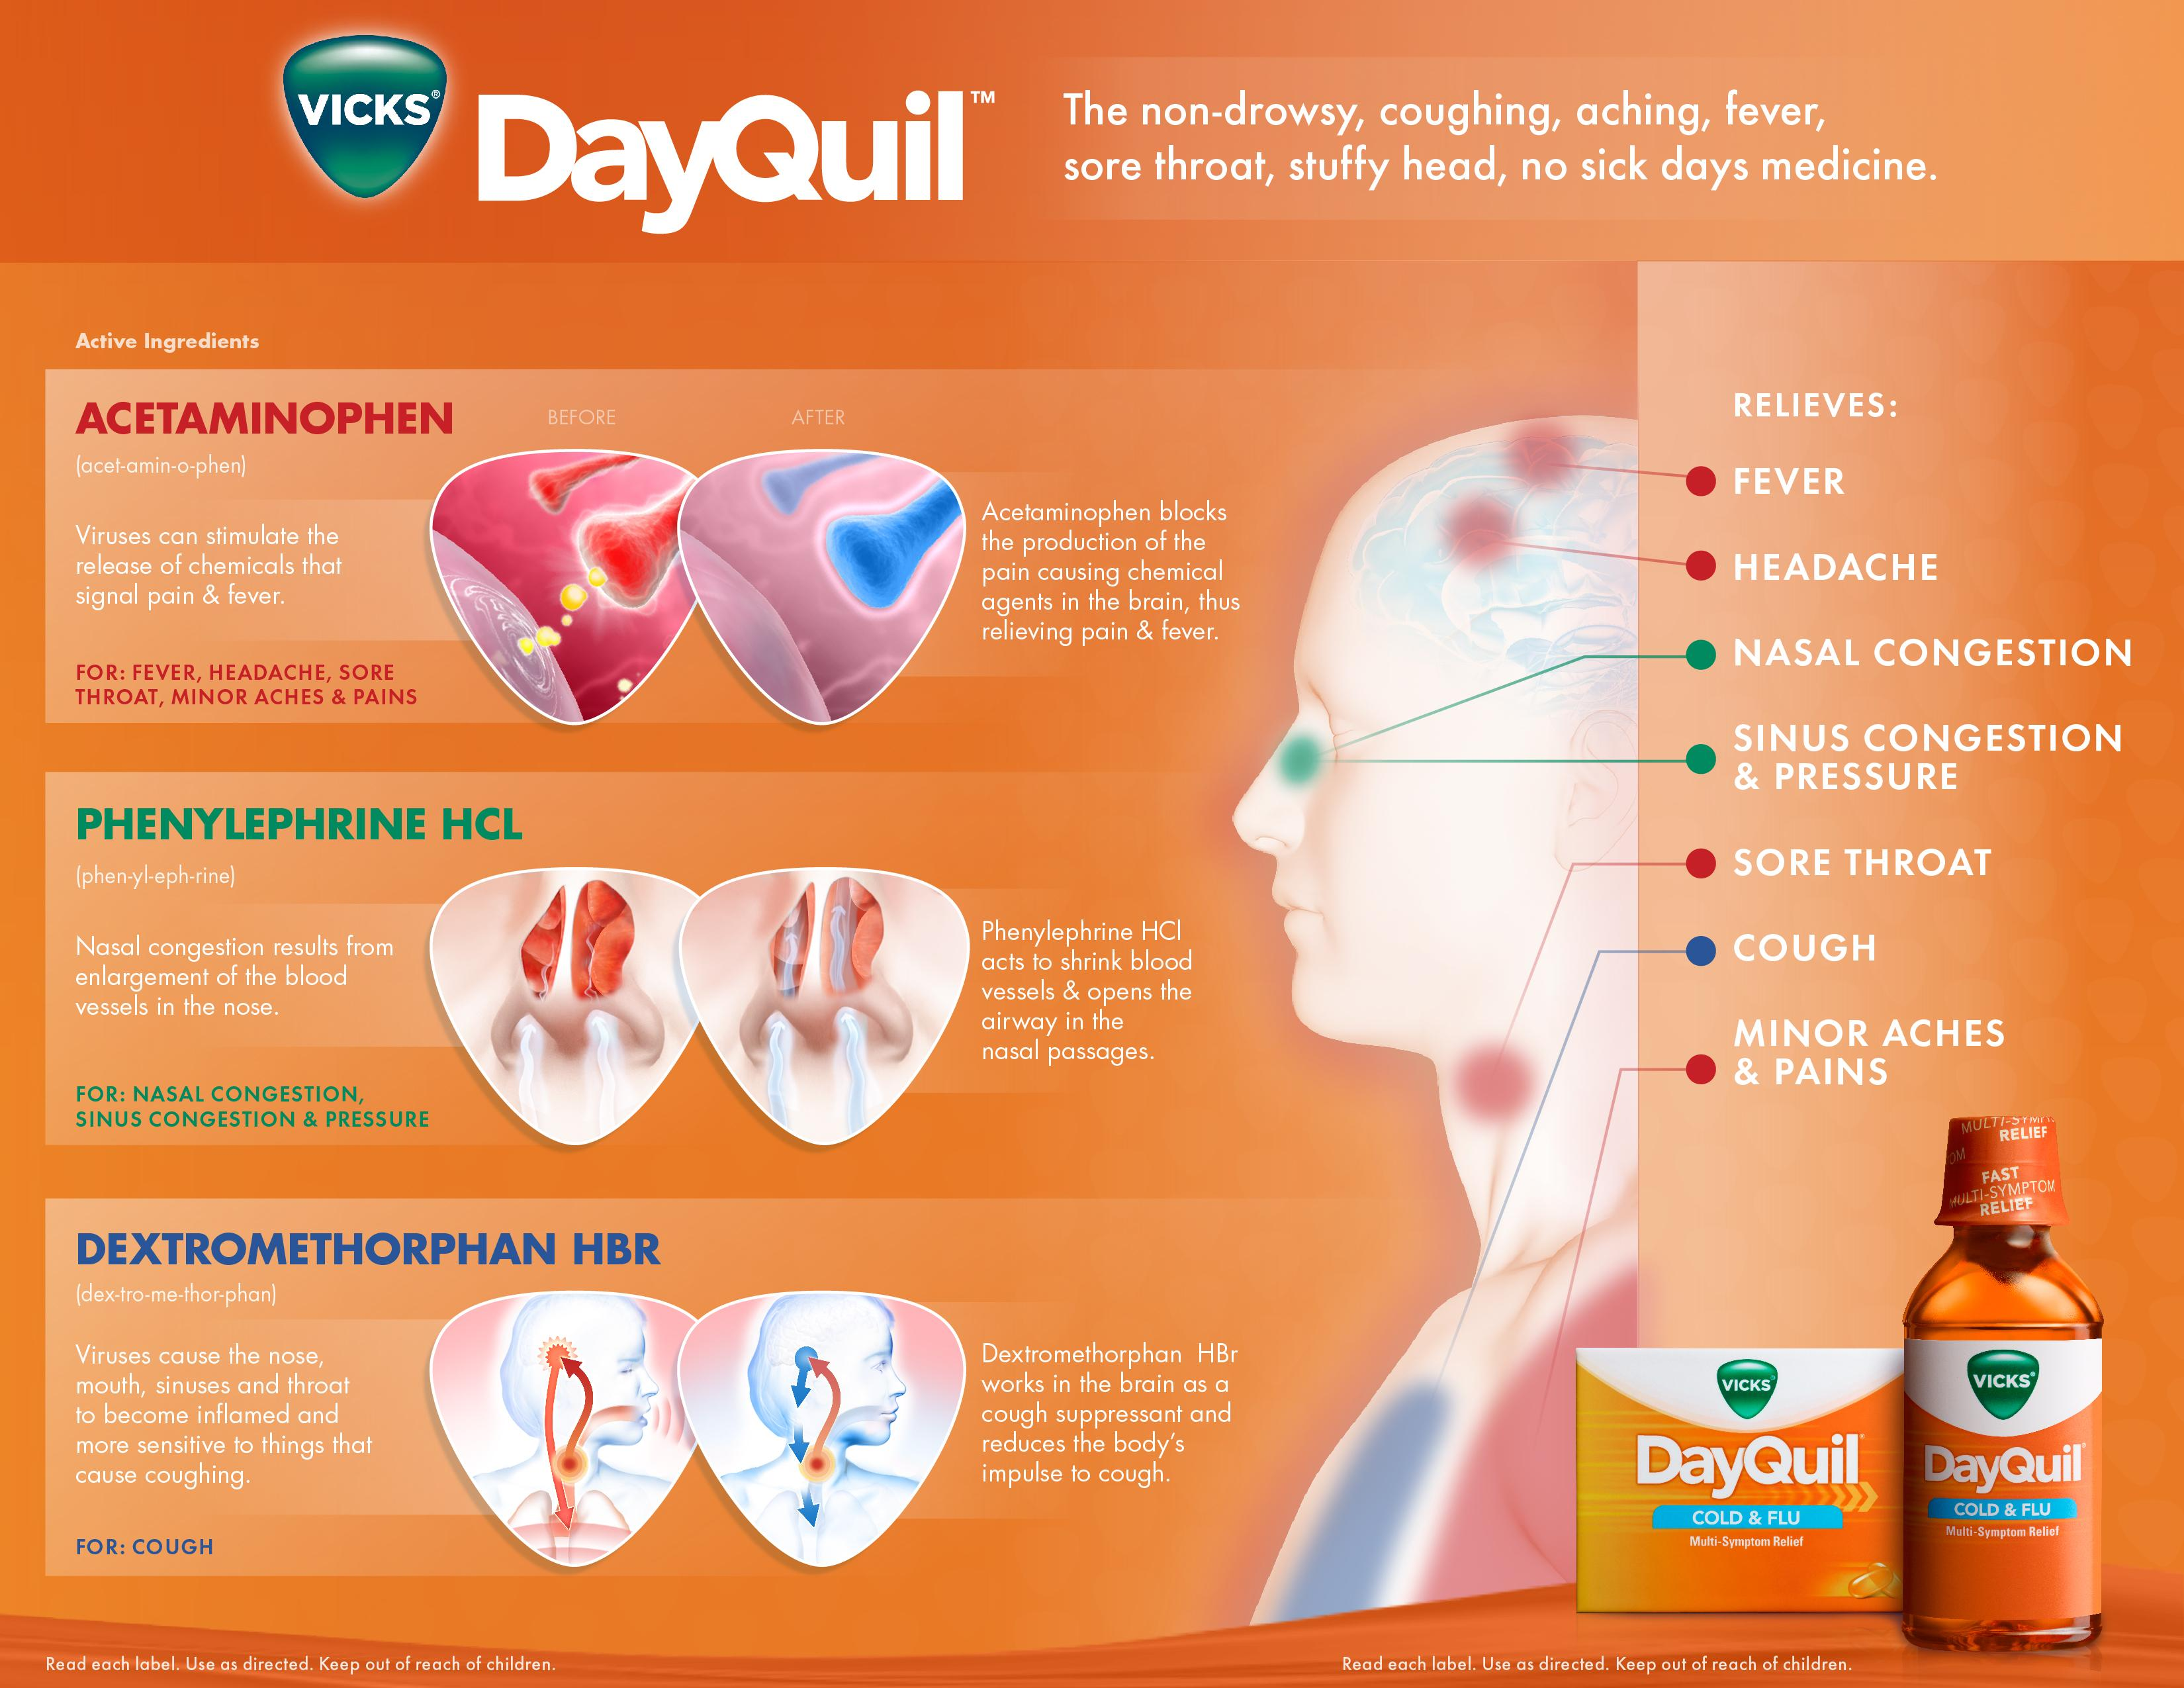 Amazon.com: Vicks DayQuil Severe Cold & Flu Relief Liquid 12 Fl Oz ...